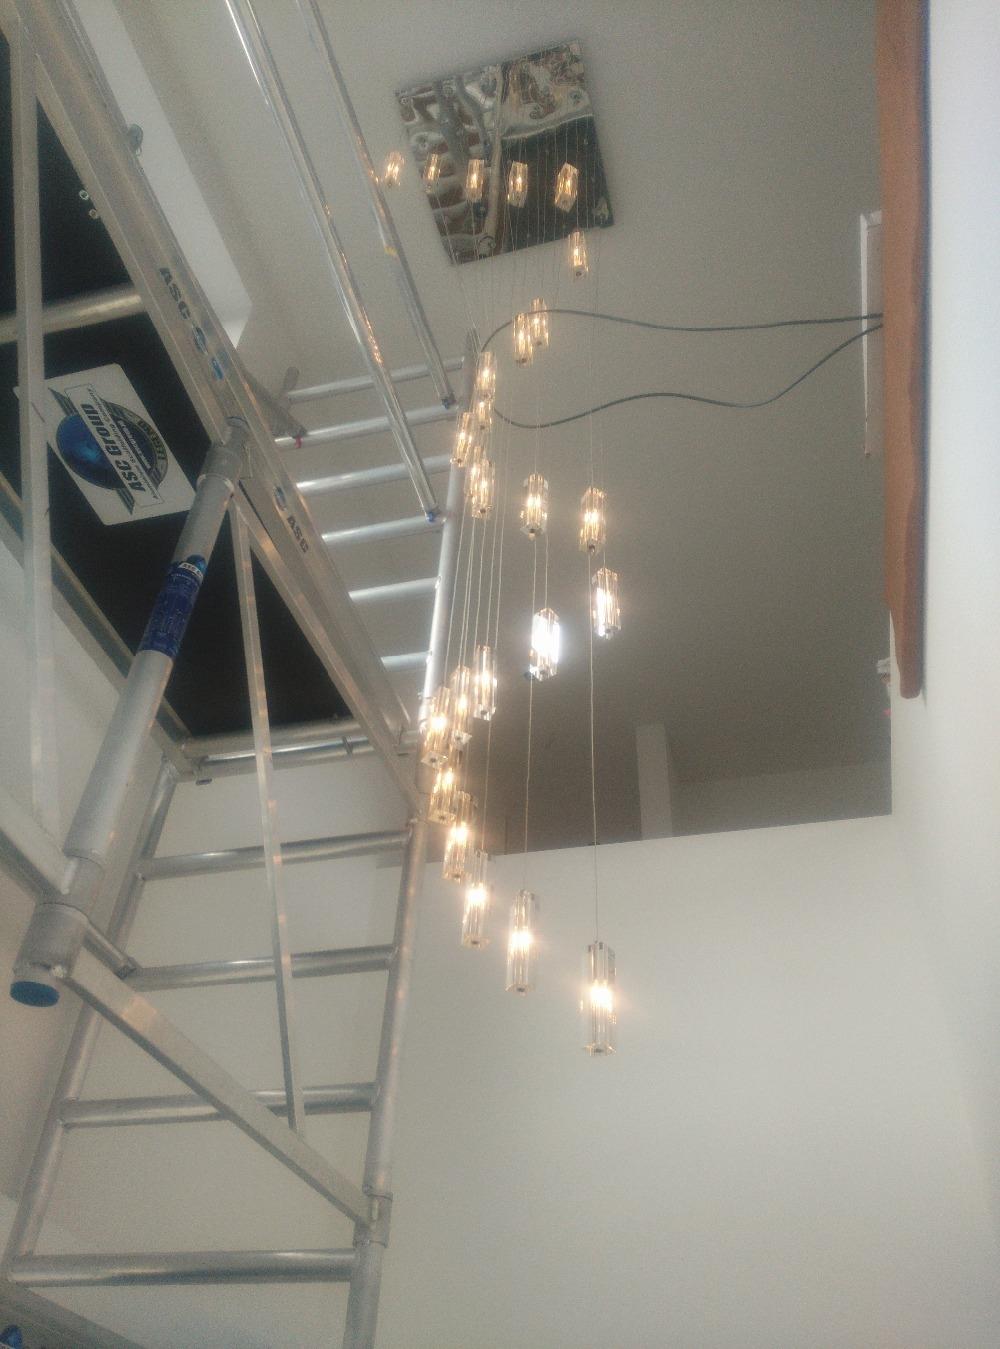 Aliexpress Buy Led Crystal Chandelier Lighting Stairway Long Pertaining To Stairway Chandeliers (#6 of 12)